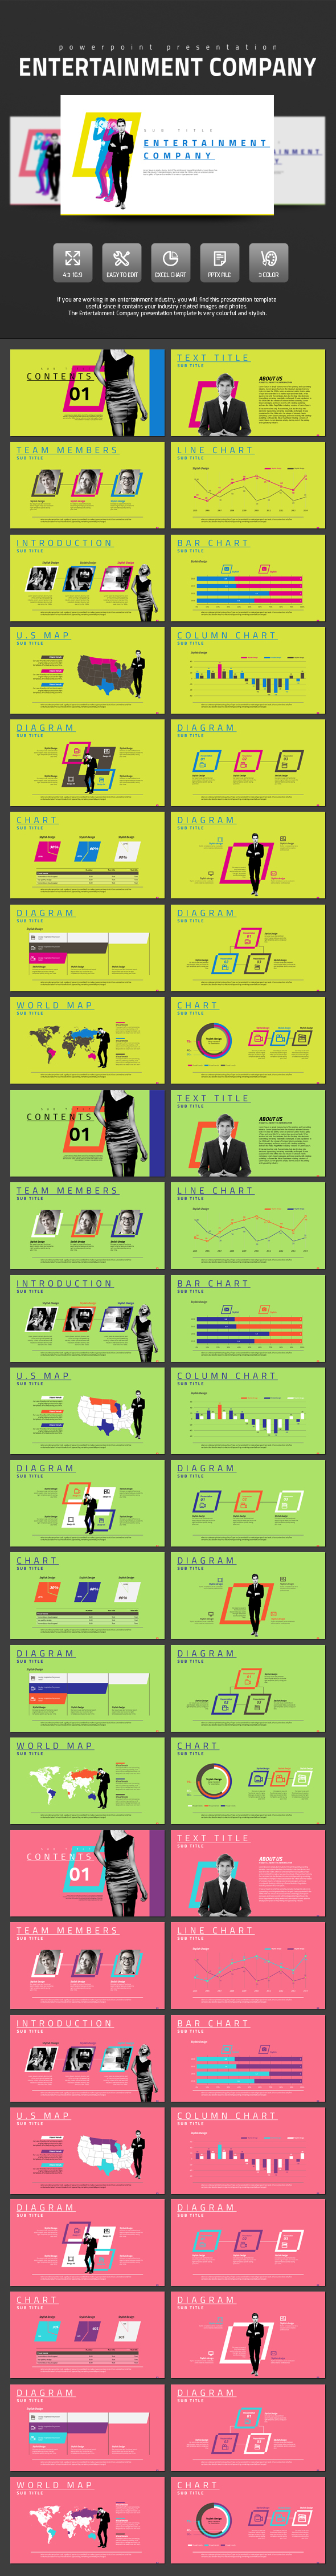 Entertainment Company - PowerPoint Templates Presentation Templates